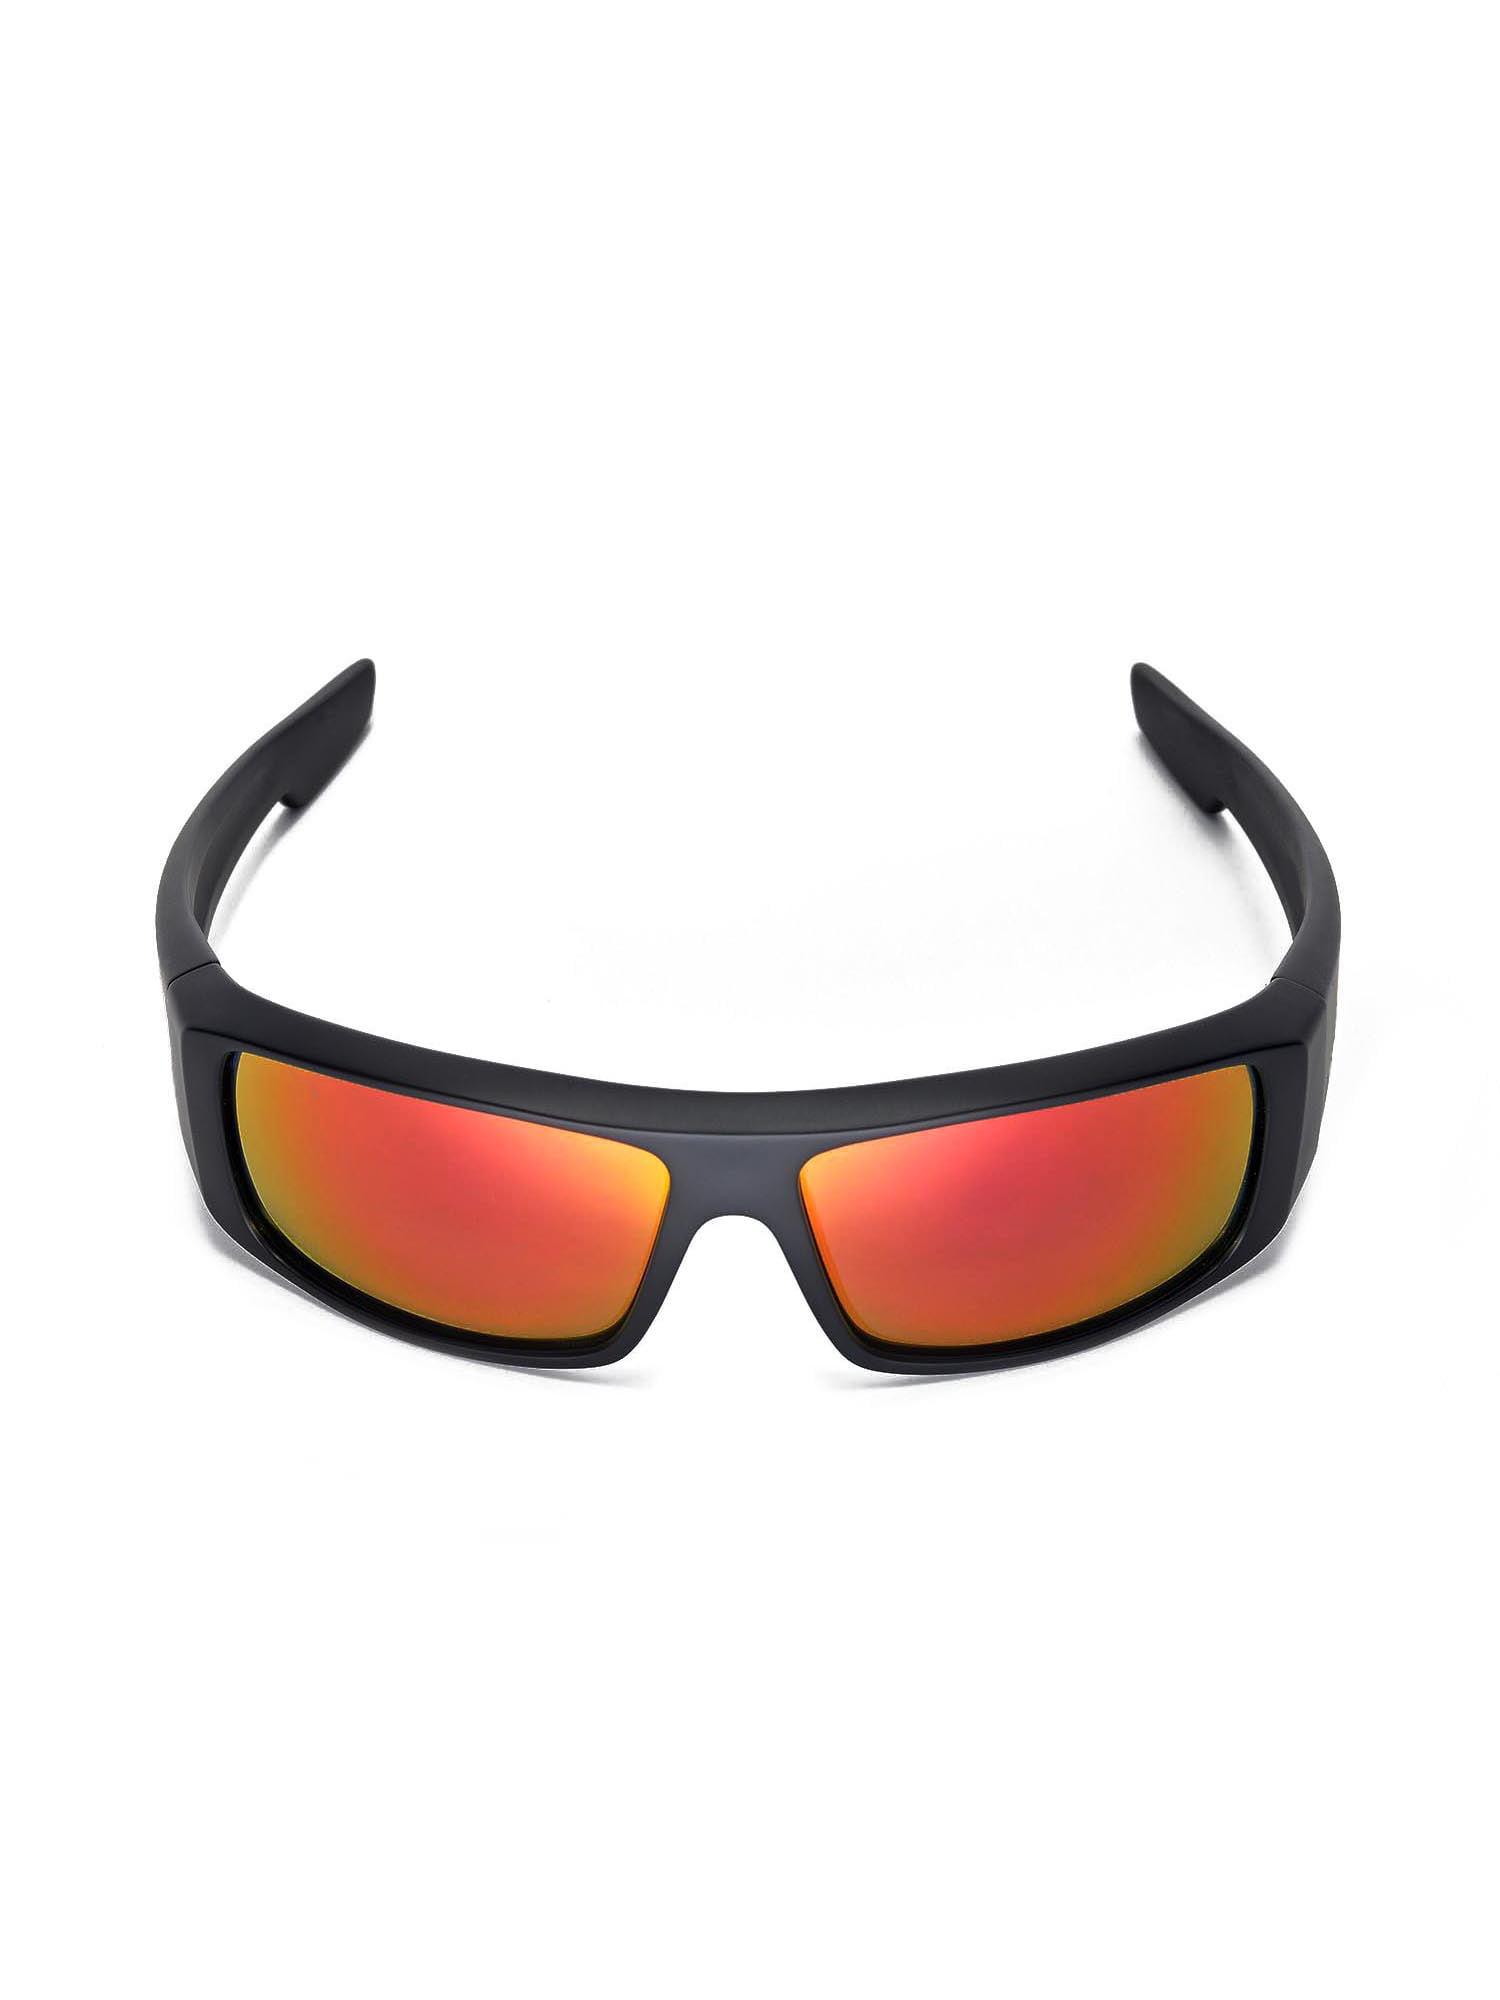 a72c09f50e Walleva - Walleva Black Polarized Replacement Lenses for Spy Optic Logan  Sunglasses - Walmart.com